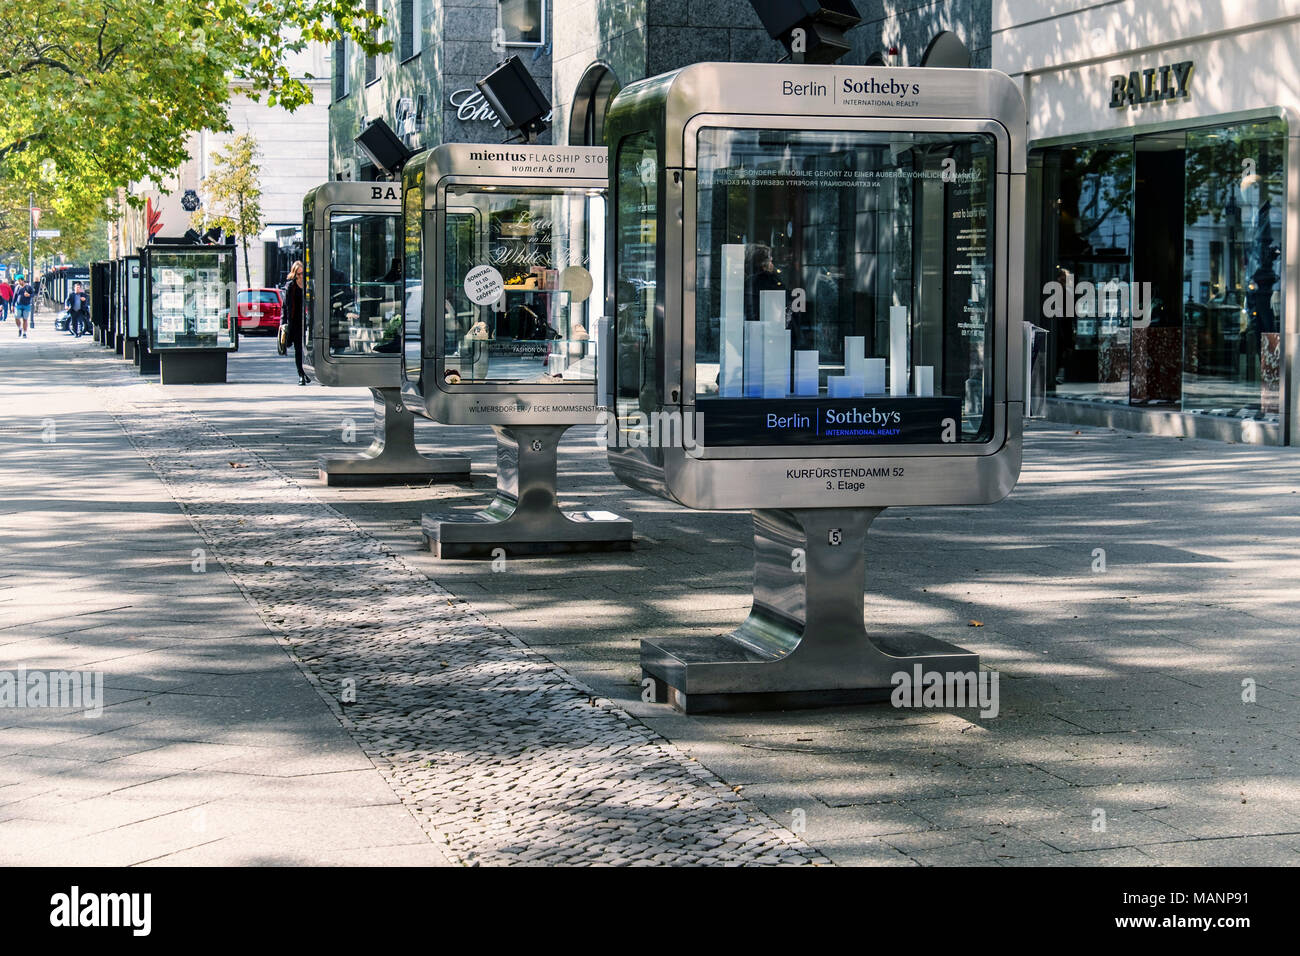 1aabb848ec1b52 Berlin Charlottenburg.Kurfürstendamm shopping street.Bally clothing store  display window   display case.